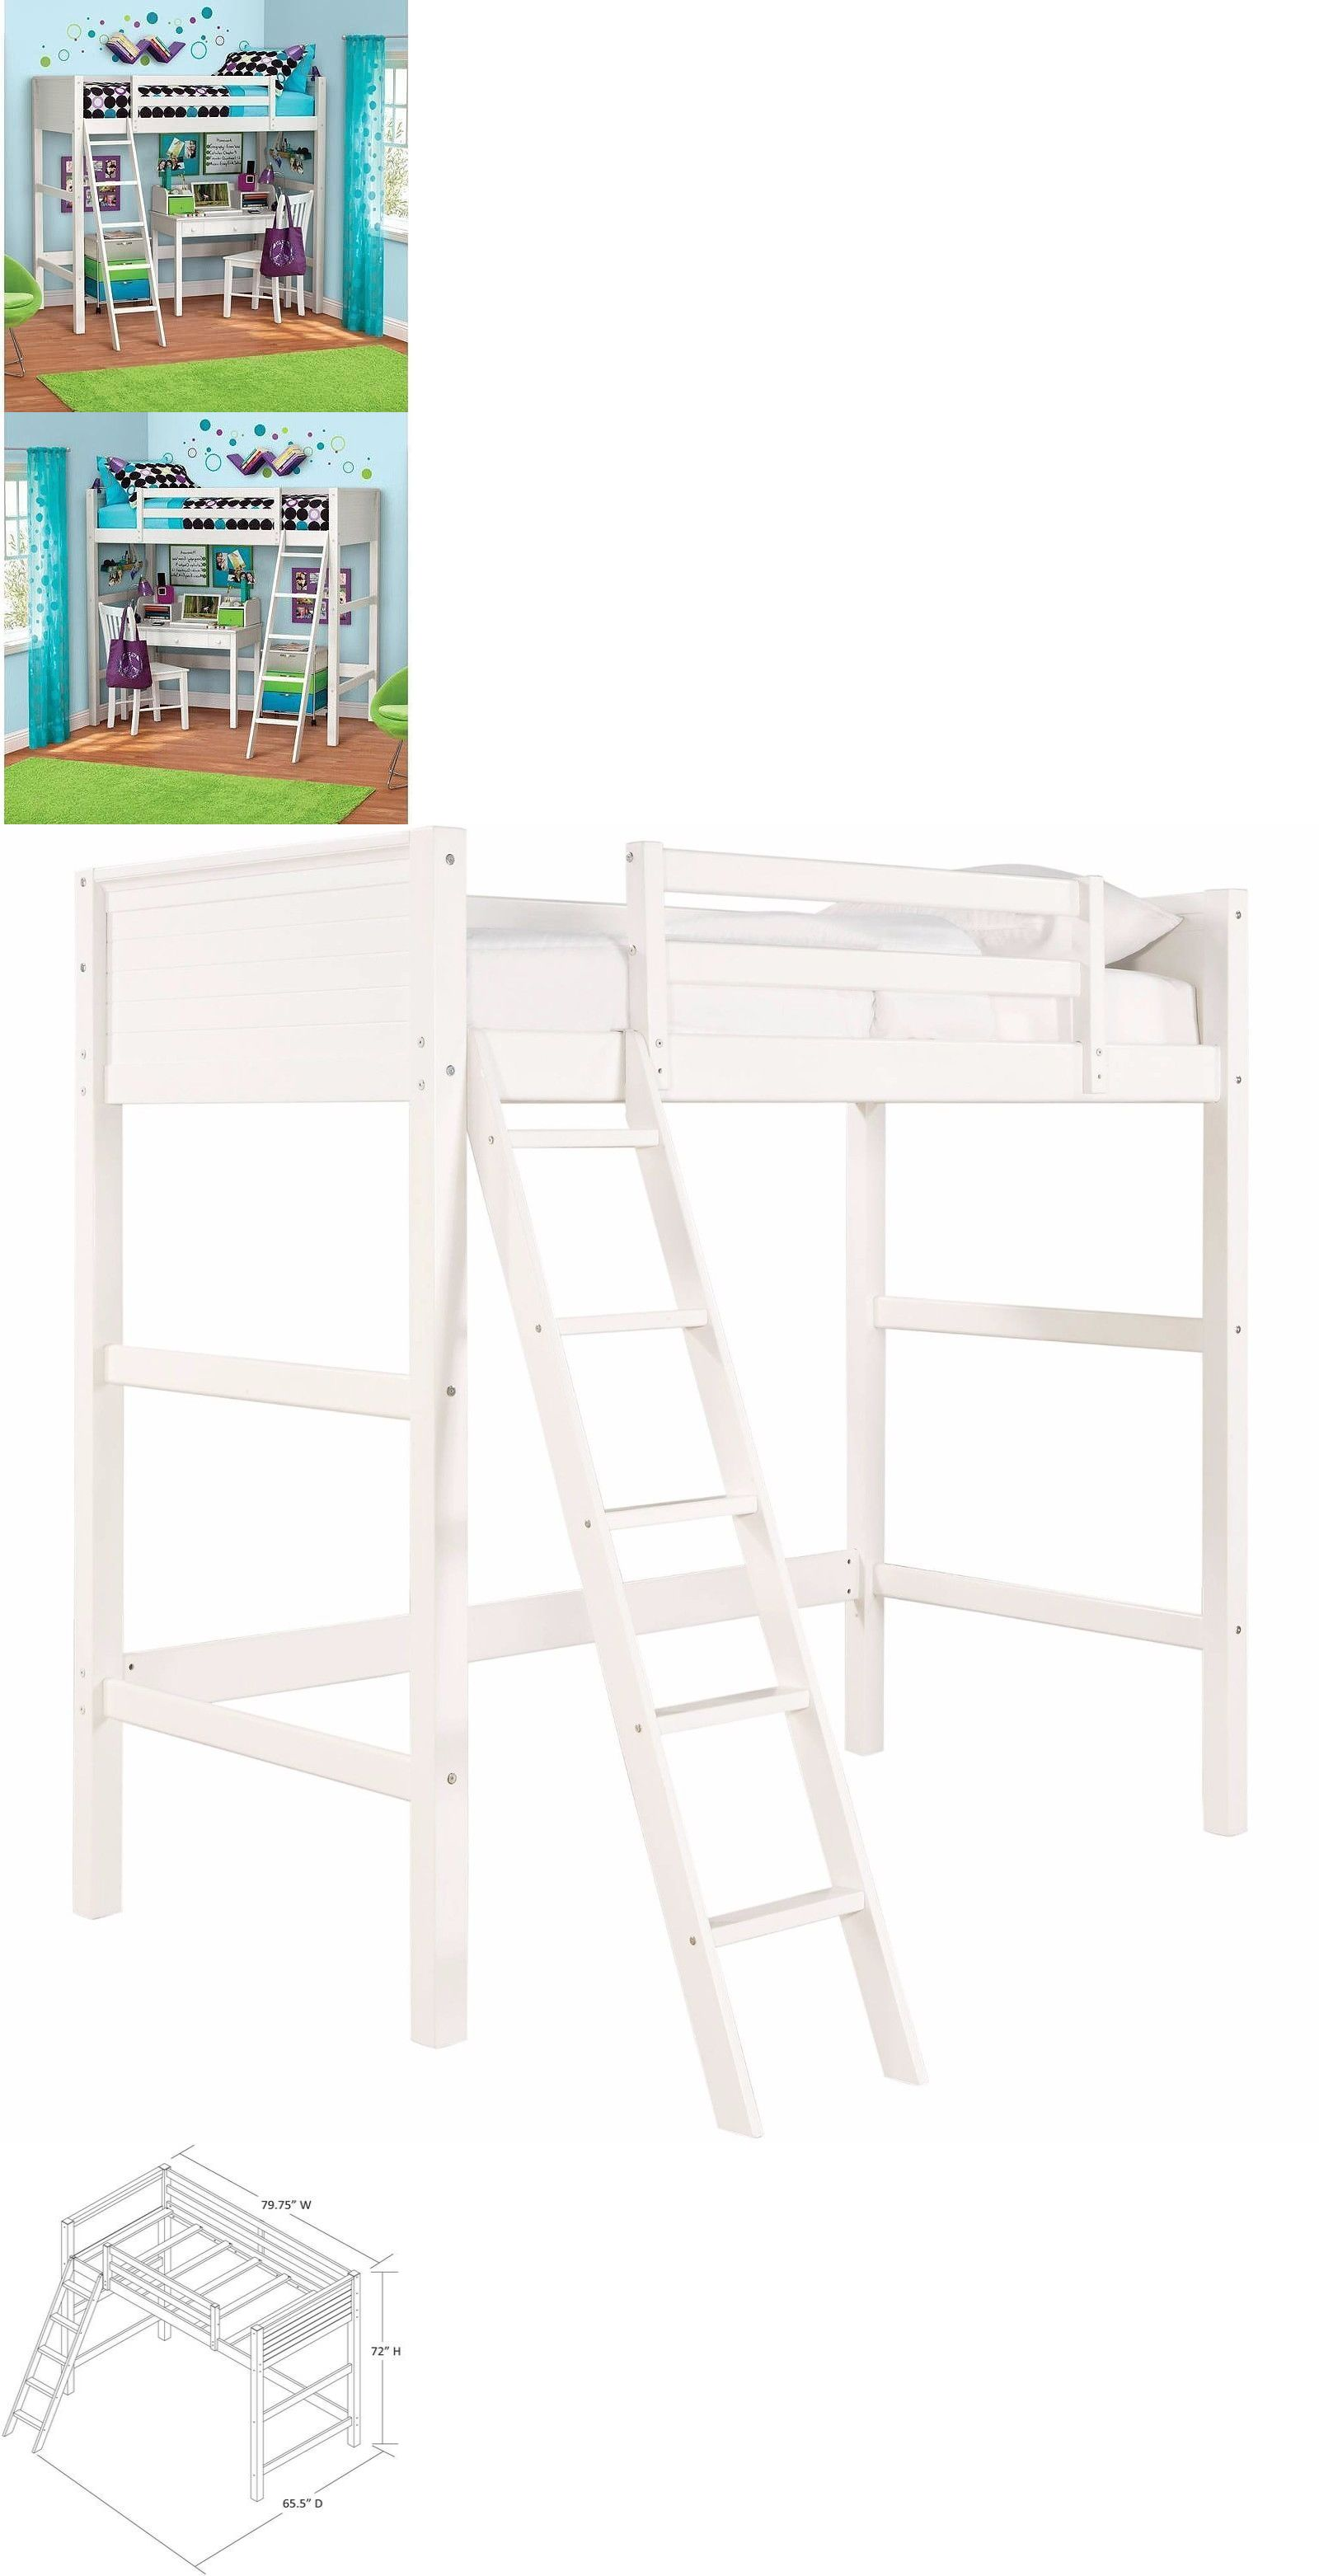 Loft captains bed twin  Bedroom Furniture  Twin Bunk Loft Bed Over Desk With Ladder